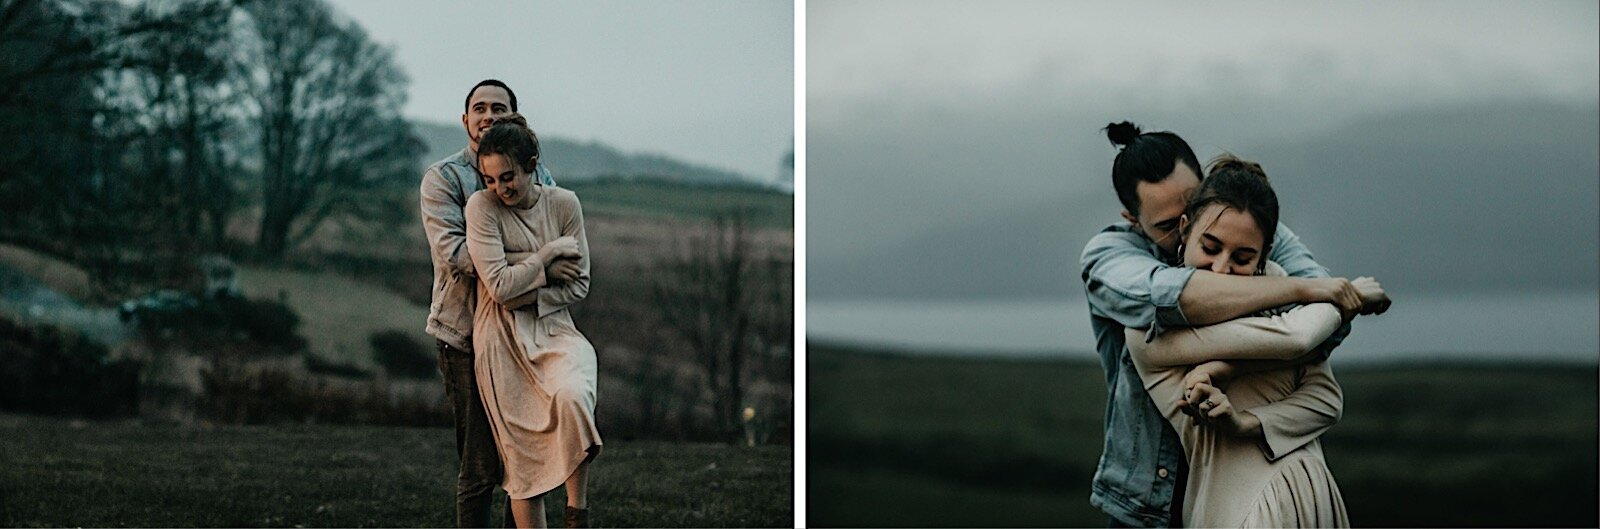 16_scotland_couple_shoot_lety_photography (29 von 36)_scotland_couple_shoot_lety_photography (30 von 36).jpg